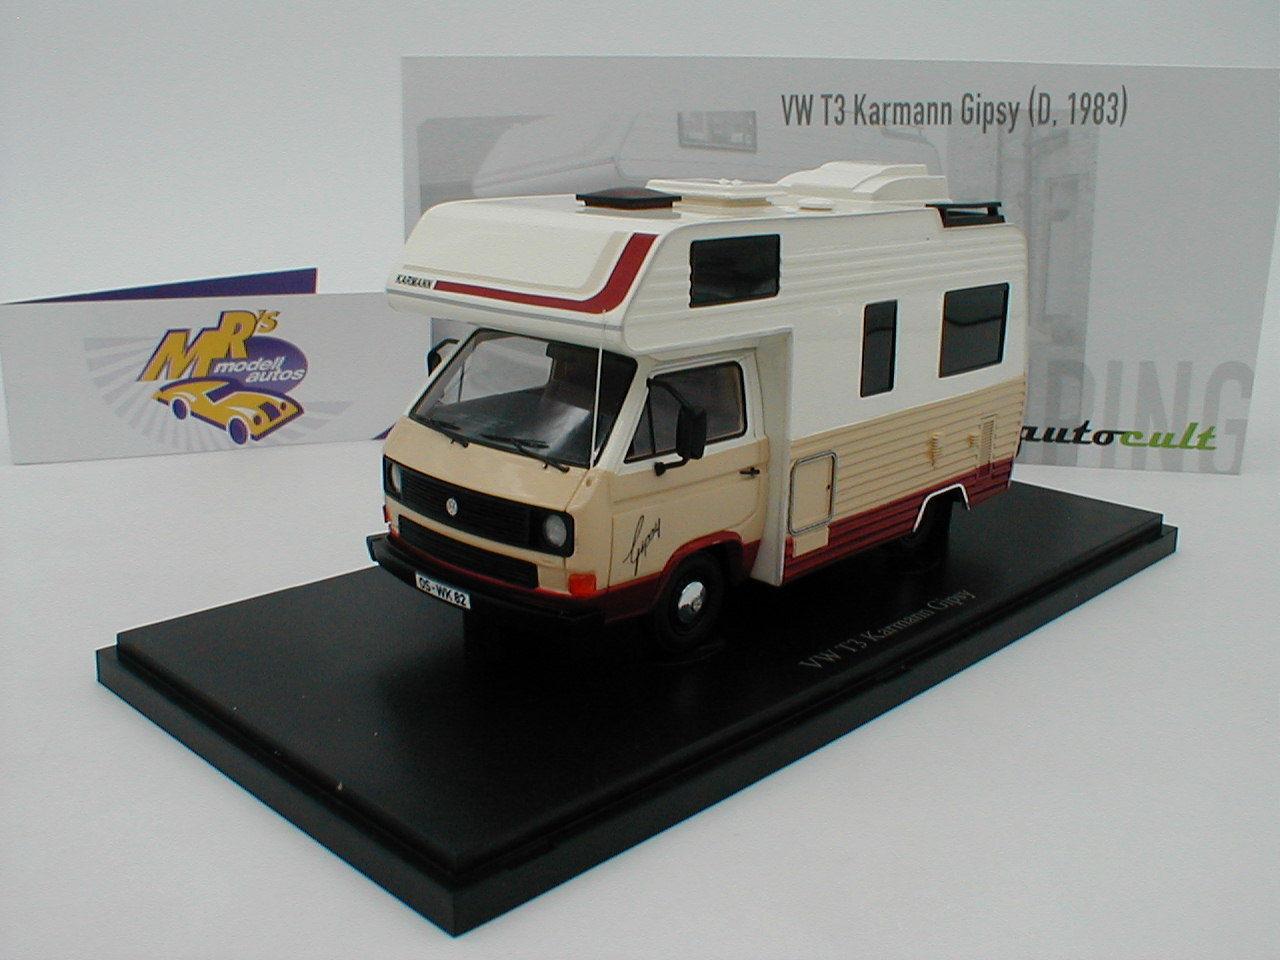 Autocult 09008 - VW T3 Karmann Gipsy Baujahr 1983   weiß-creme-rotbraun   1 43